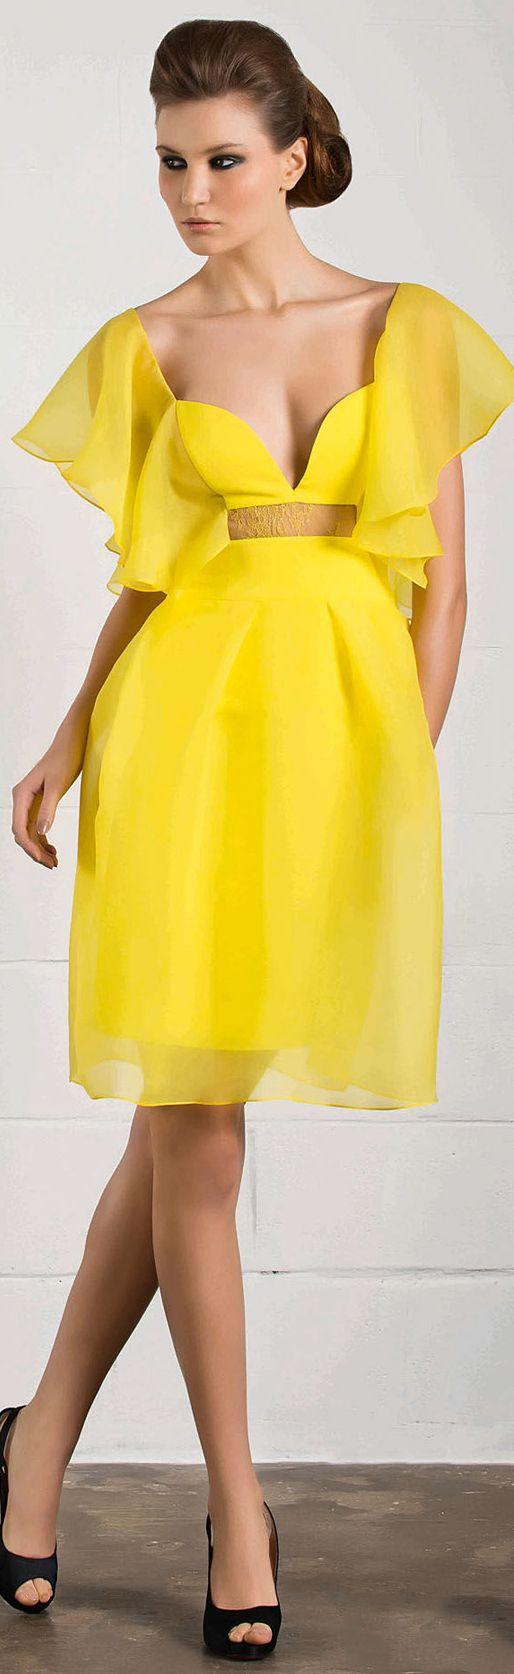 RANI ZAKHEM #cocktail #yellow #dress